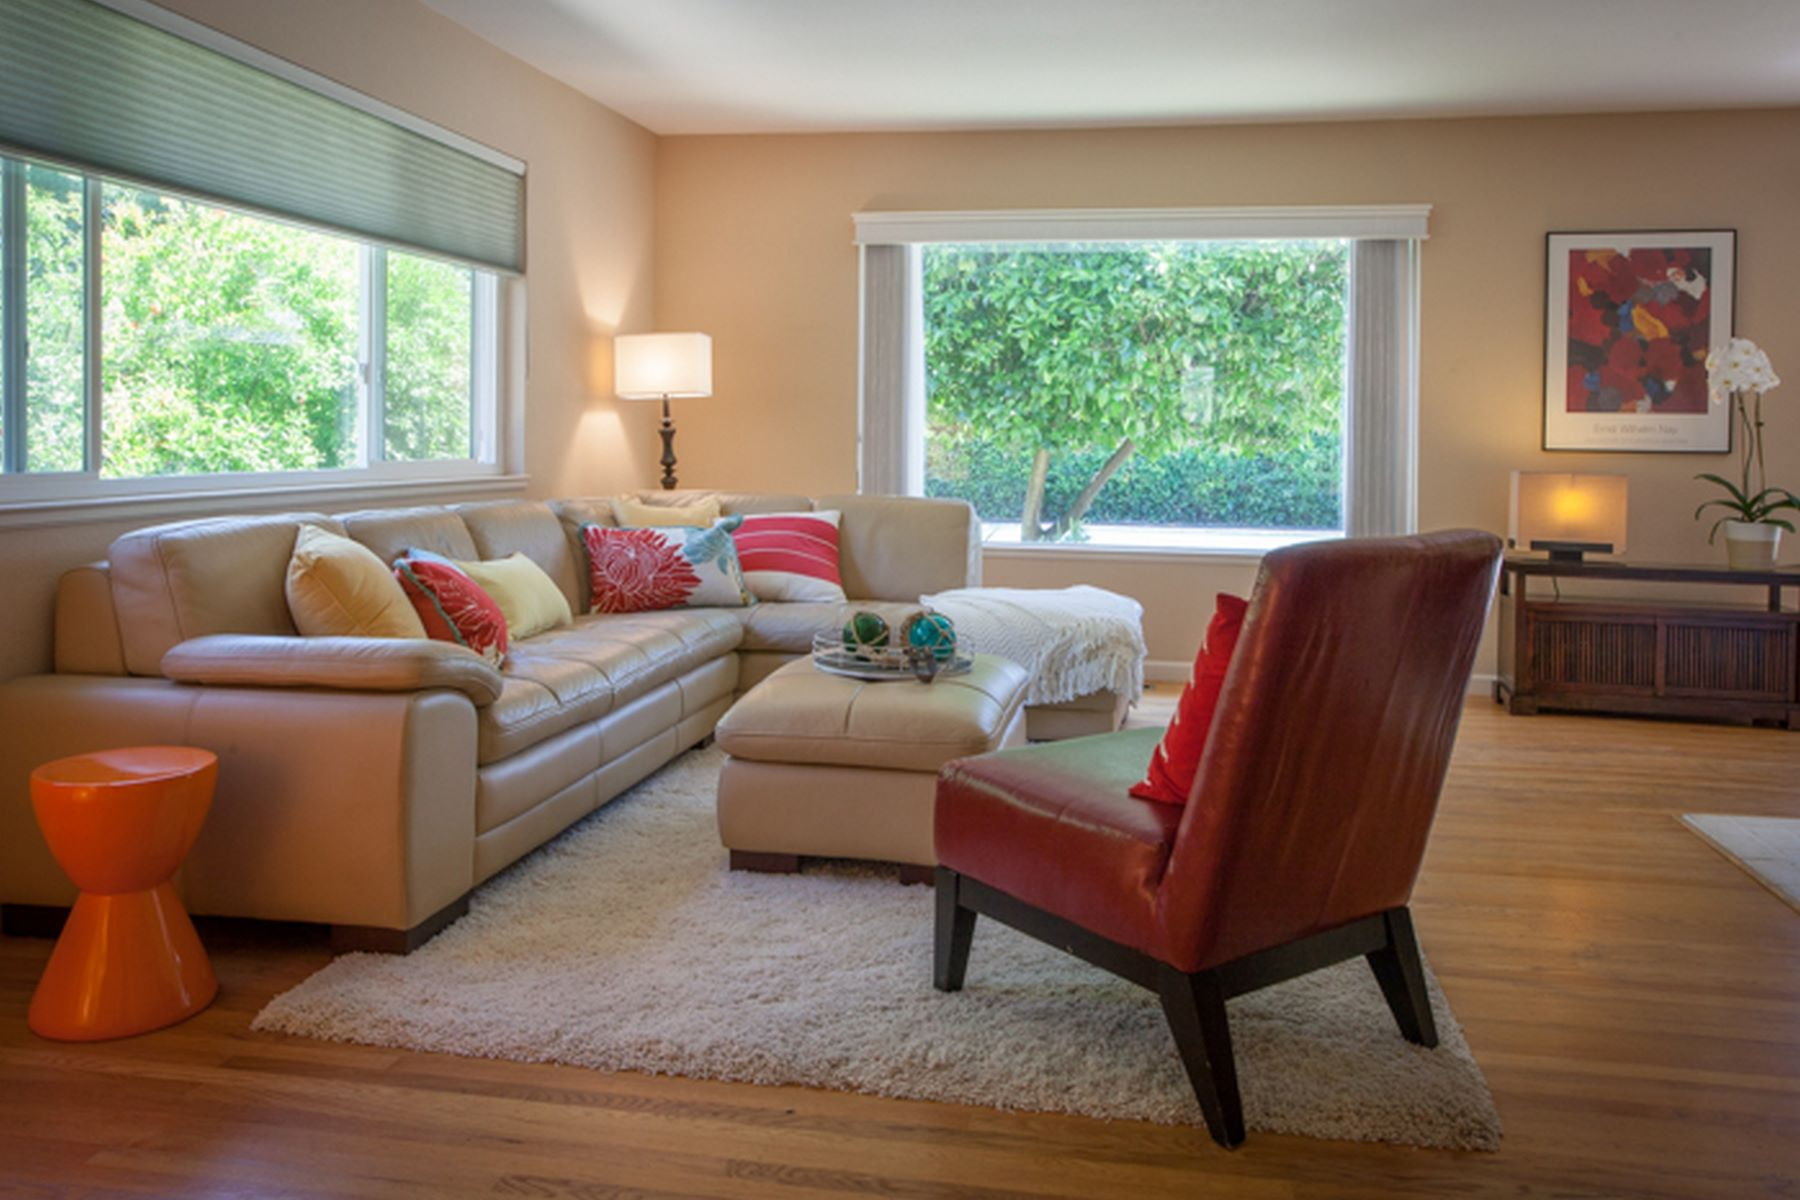 獨棟家庭住宅 為 出售 在 Kentfield-Settle In and Enjoy Marin Lifestyle 729 Sir Francis Drake Blvd Kentfield, 加利福尼亞州, 94904 美國